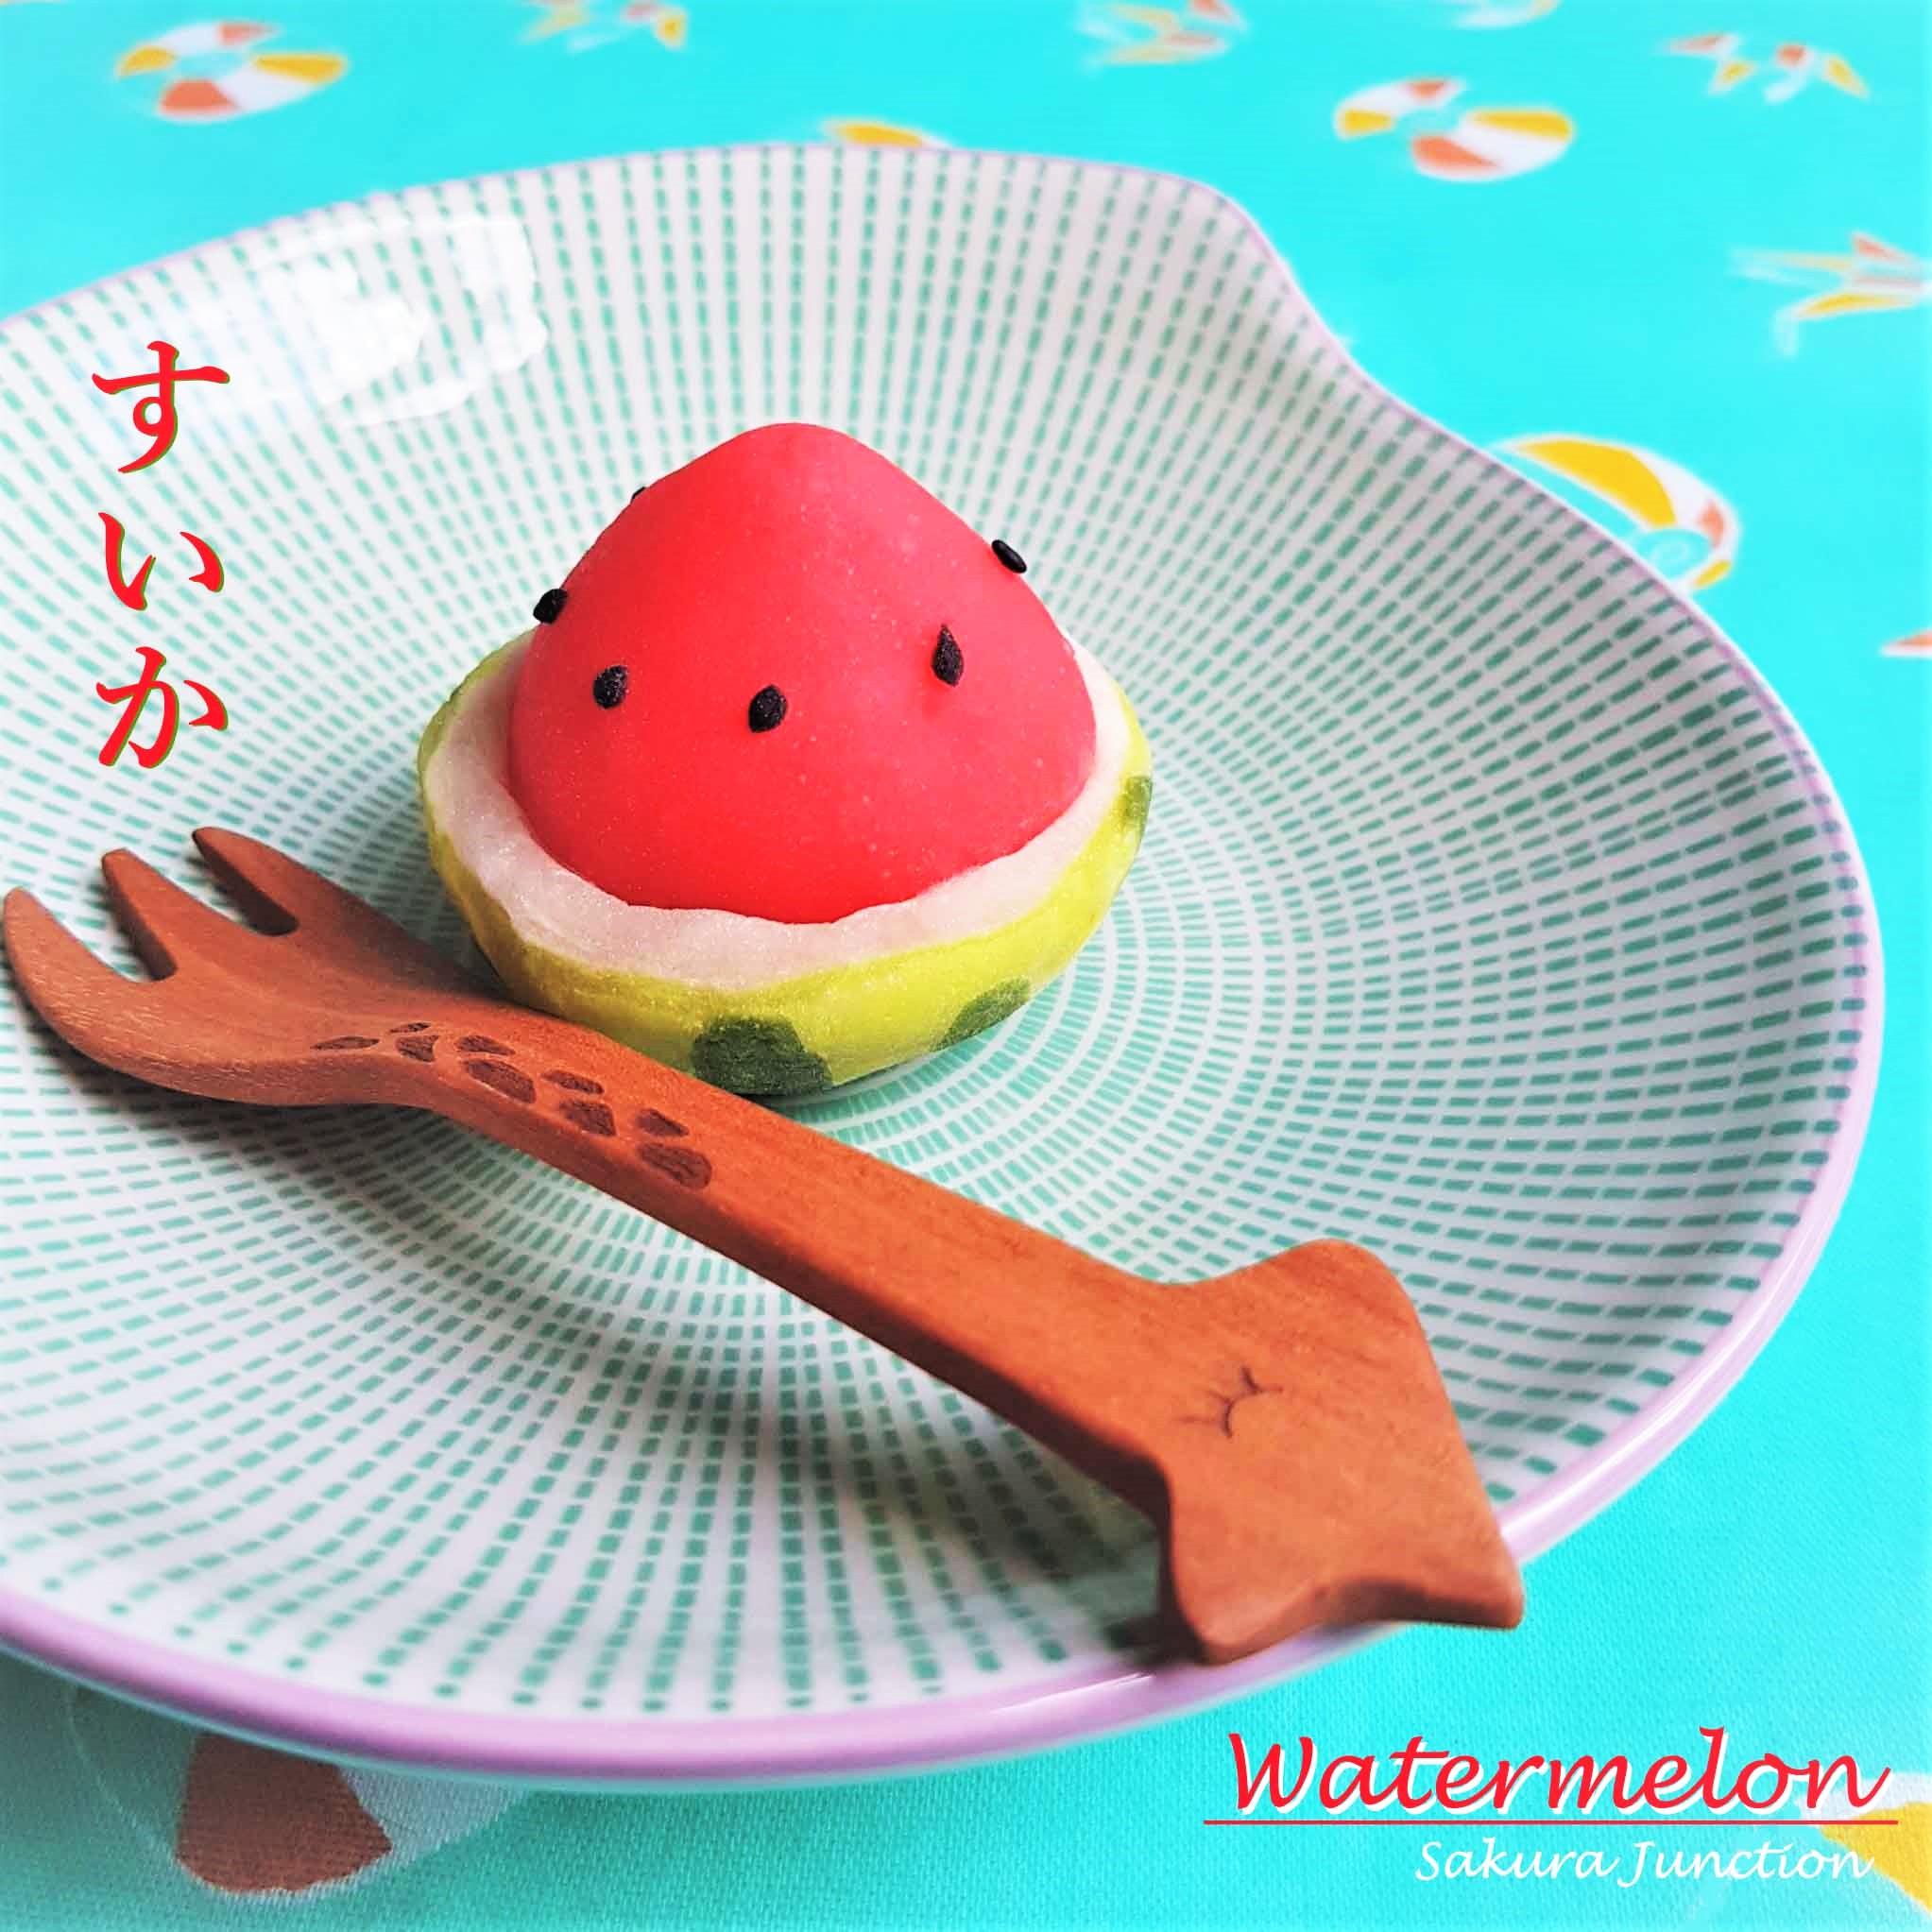 watermelon20-2-2